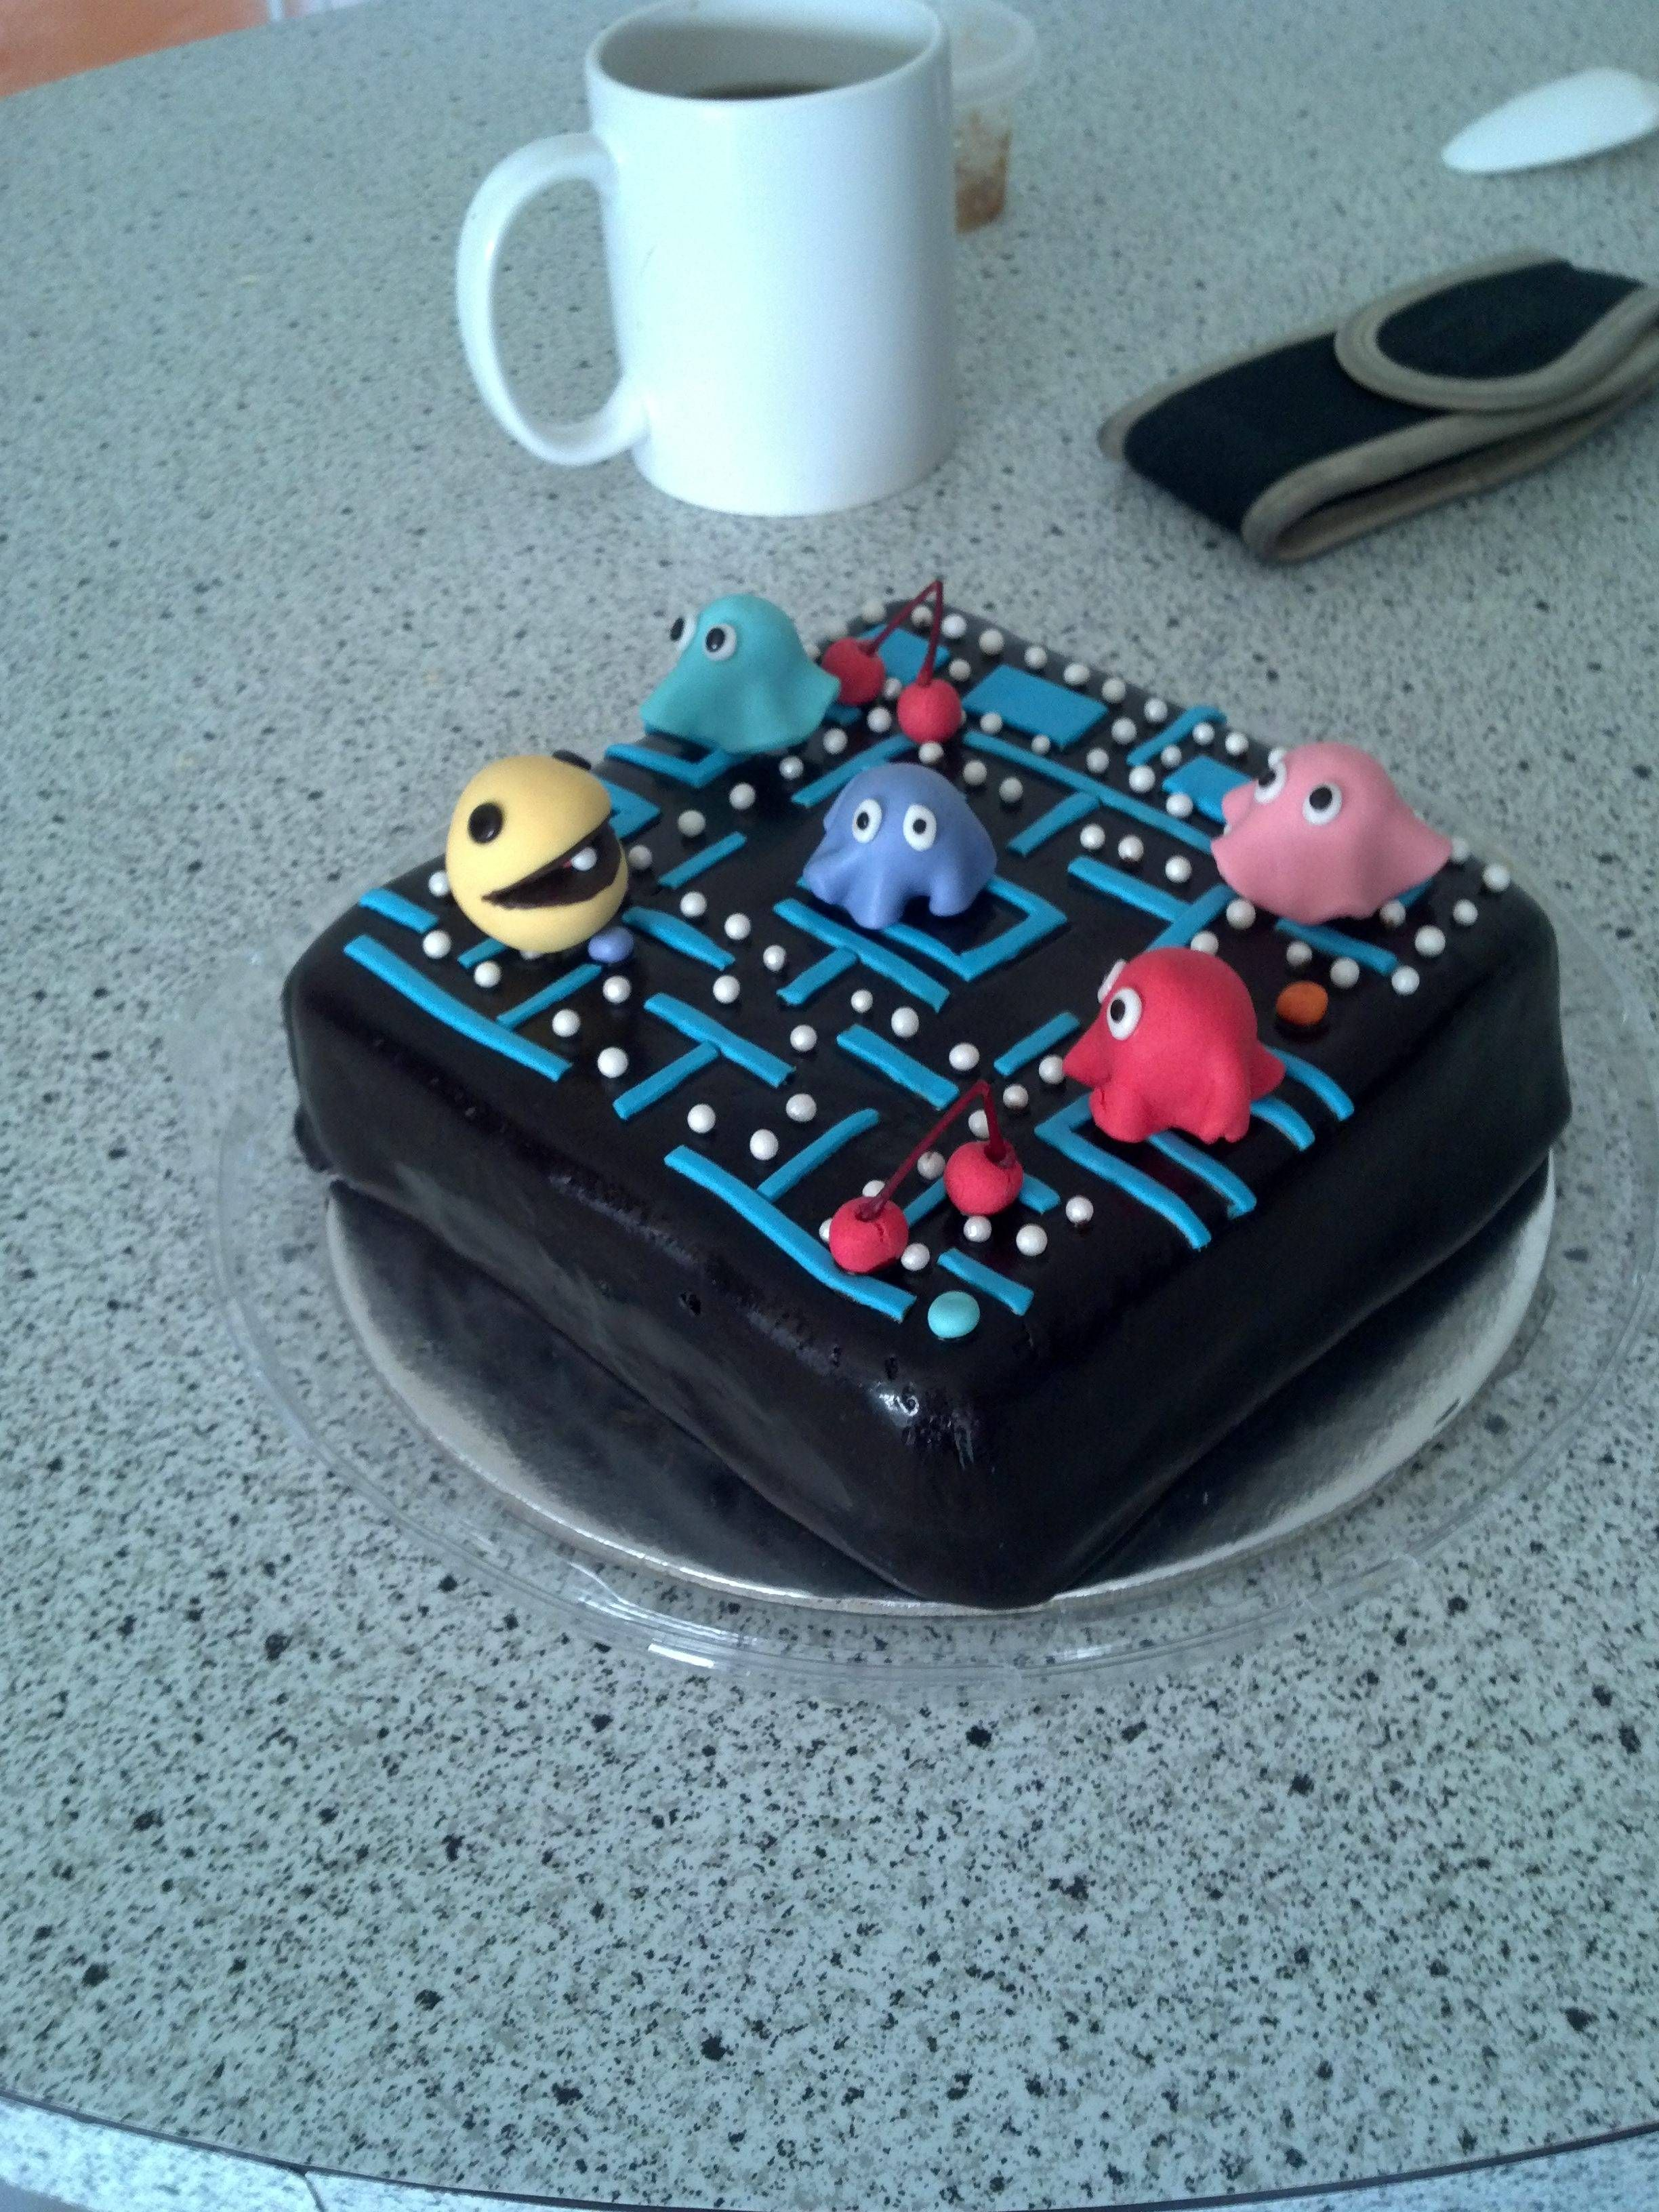 PacMan Cake via reddit user Metryx (With images) Pretty